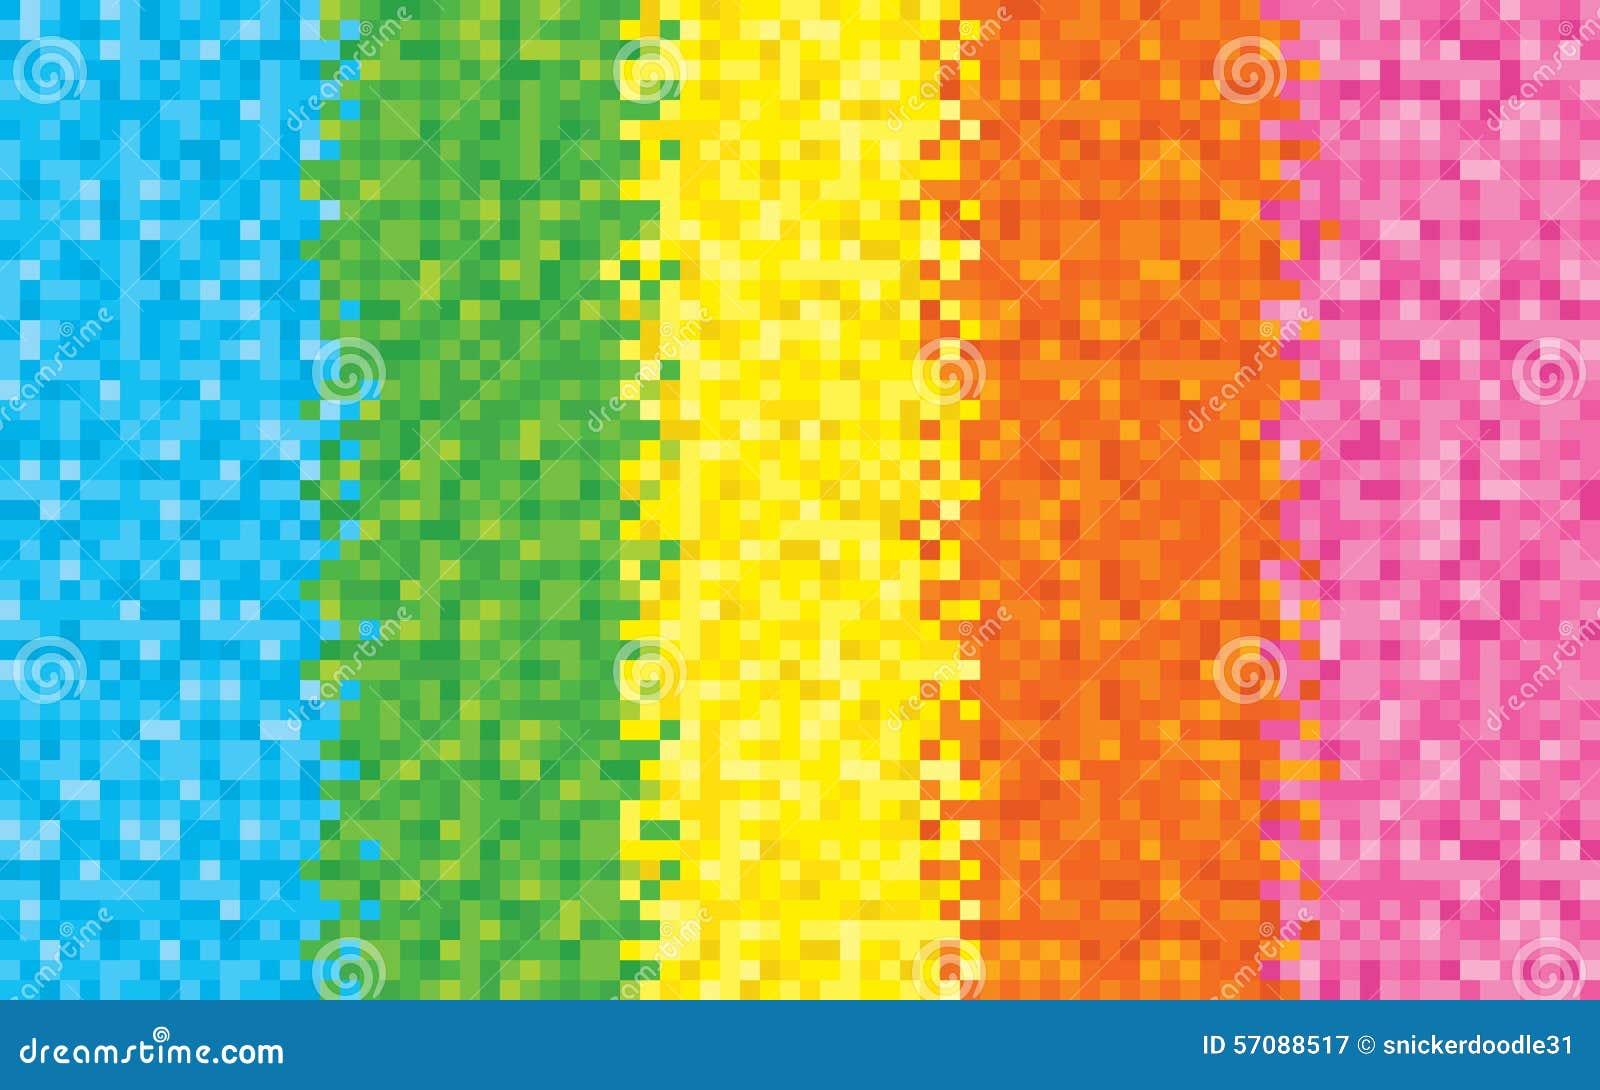 rainbow pixel background stock vector